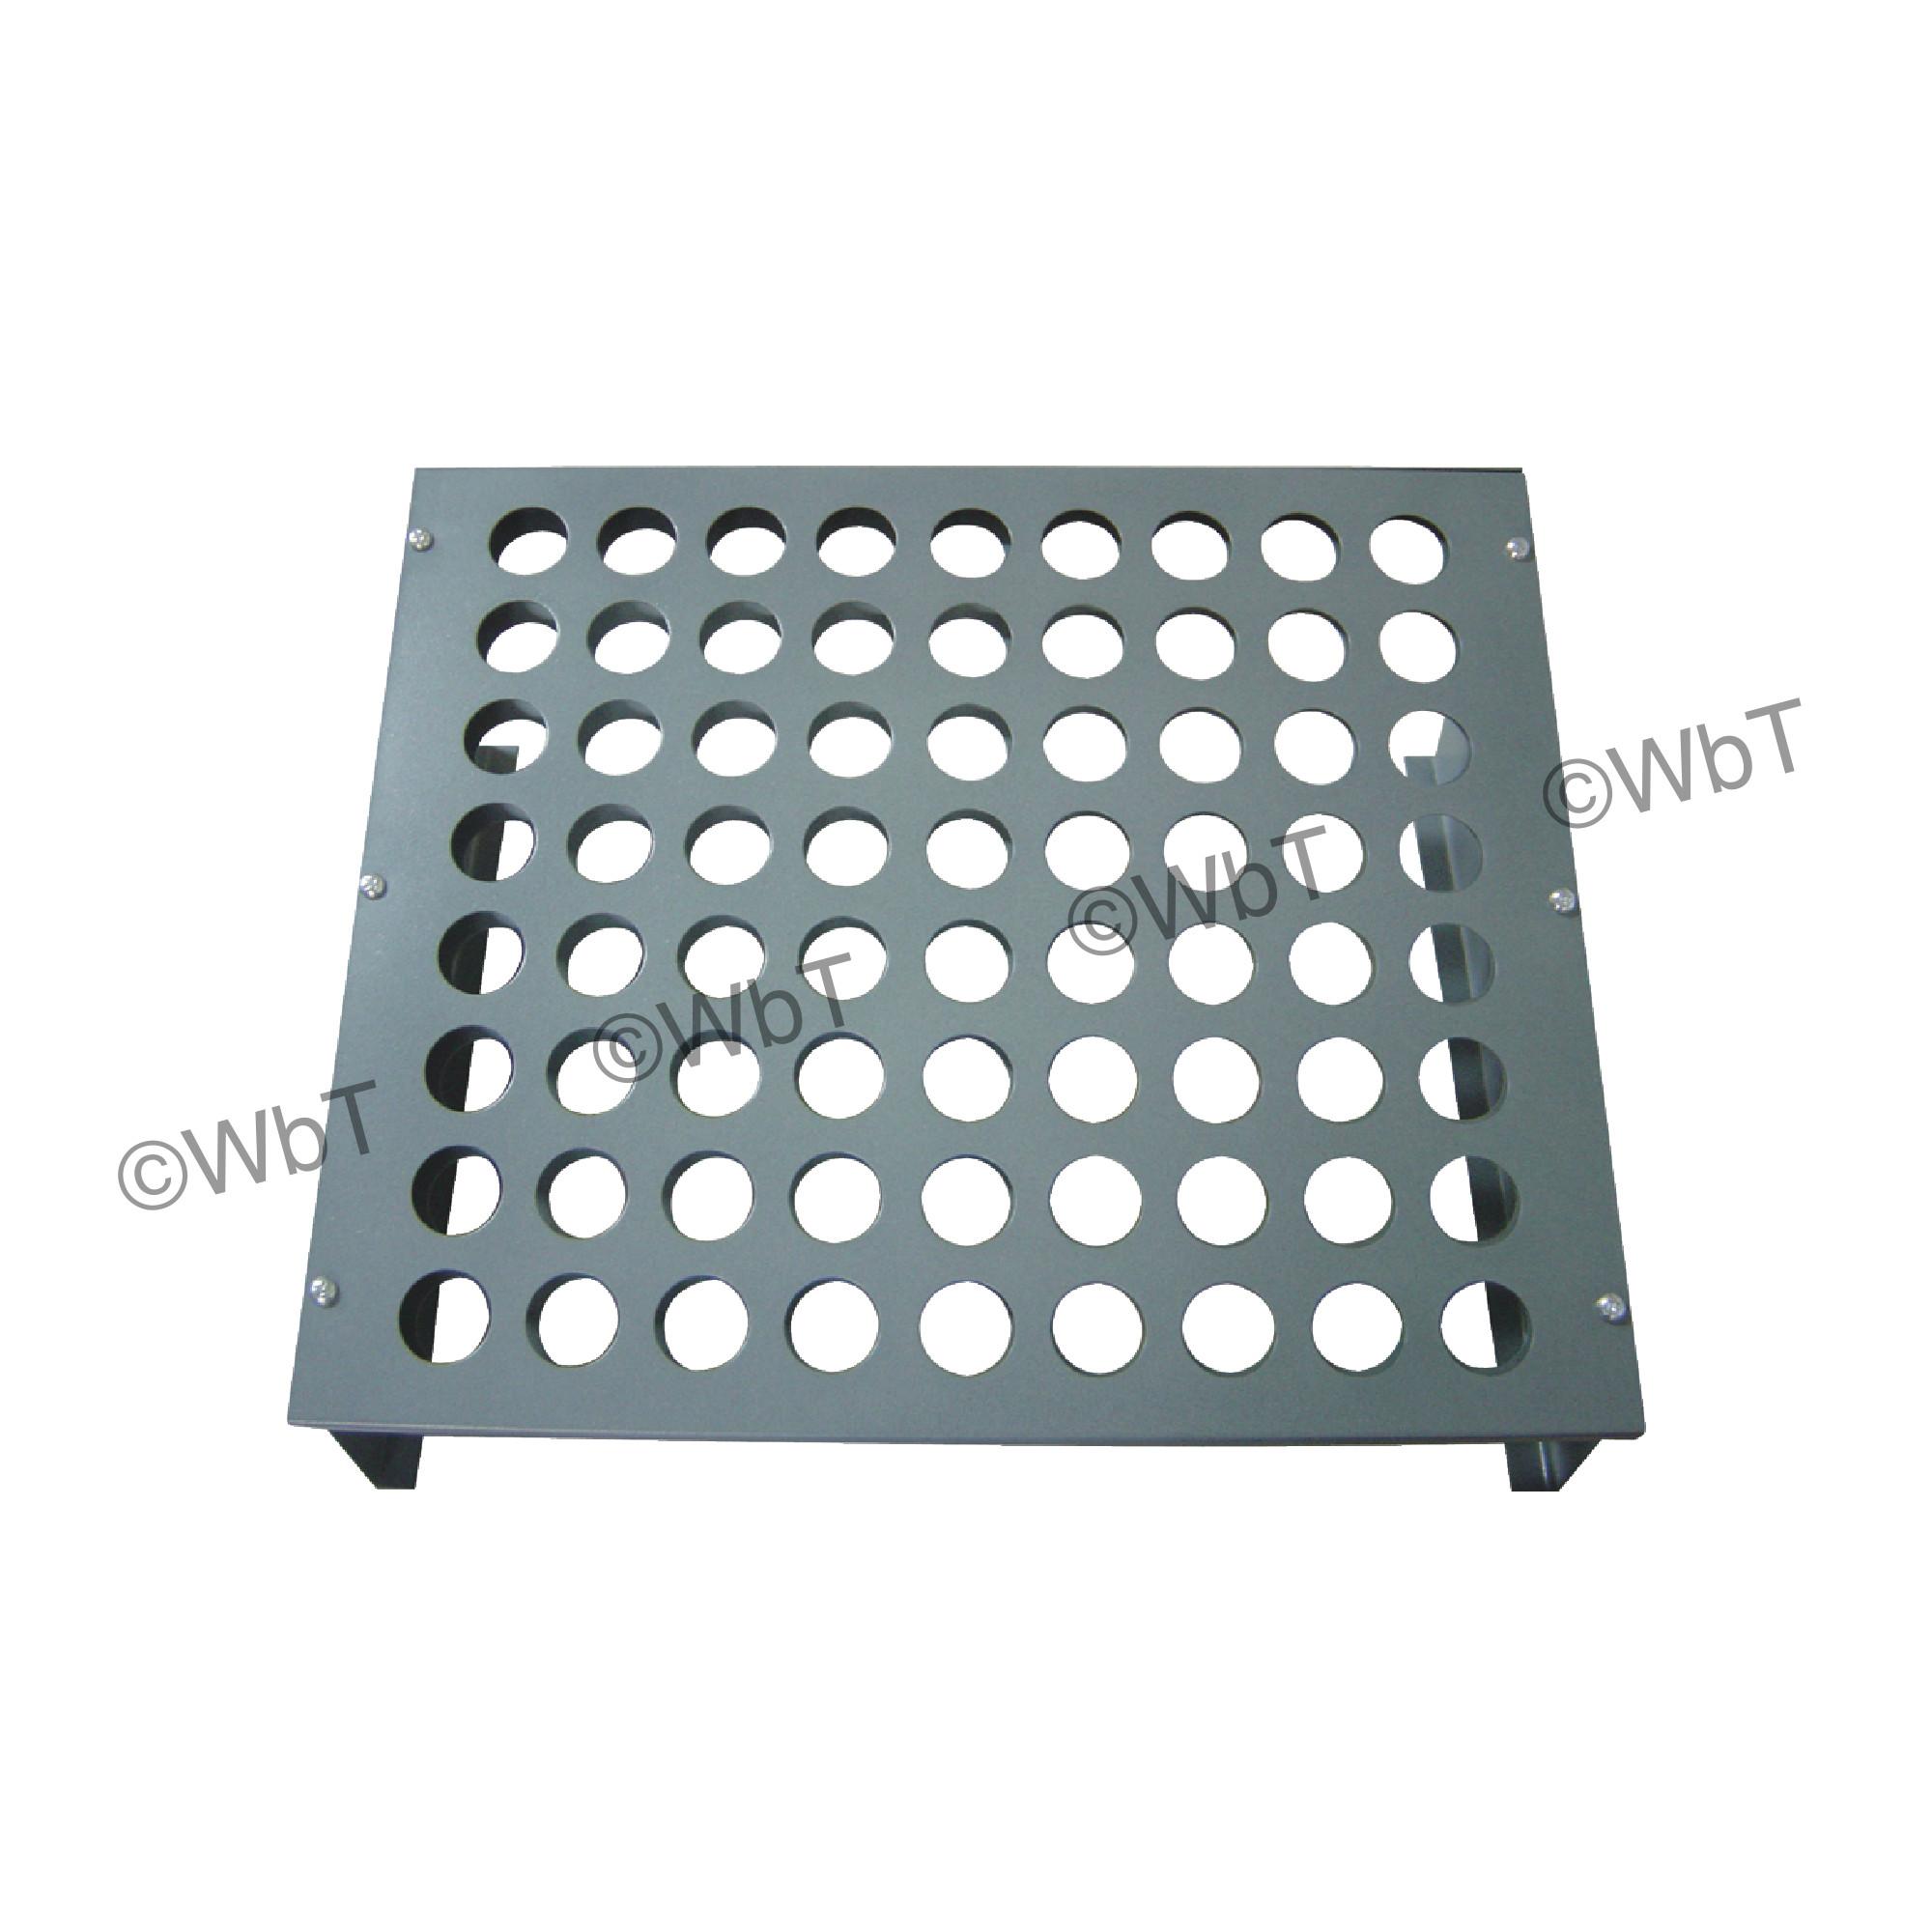 5C Collet Rack - 72 Holes